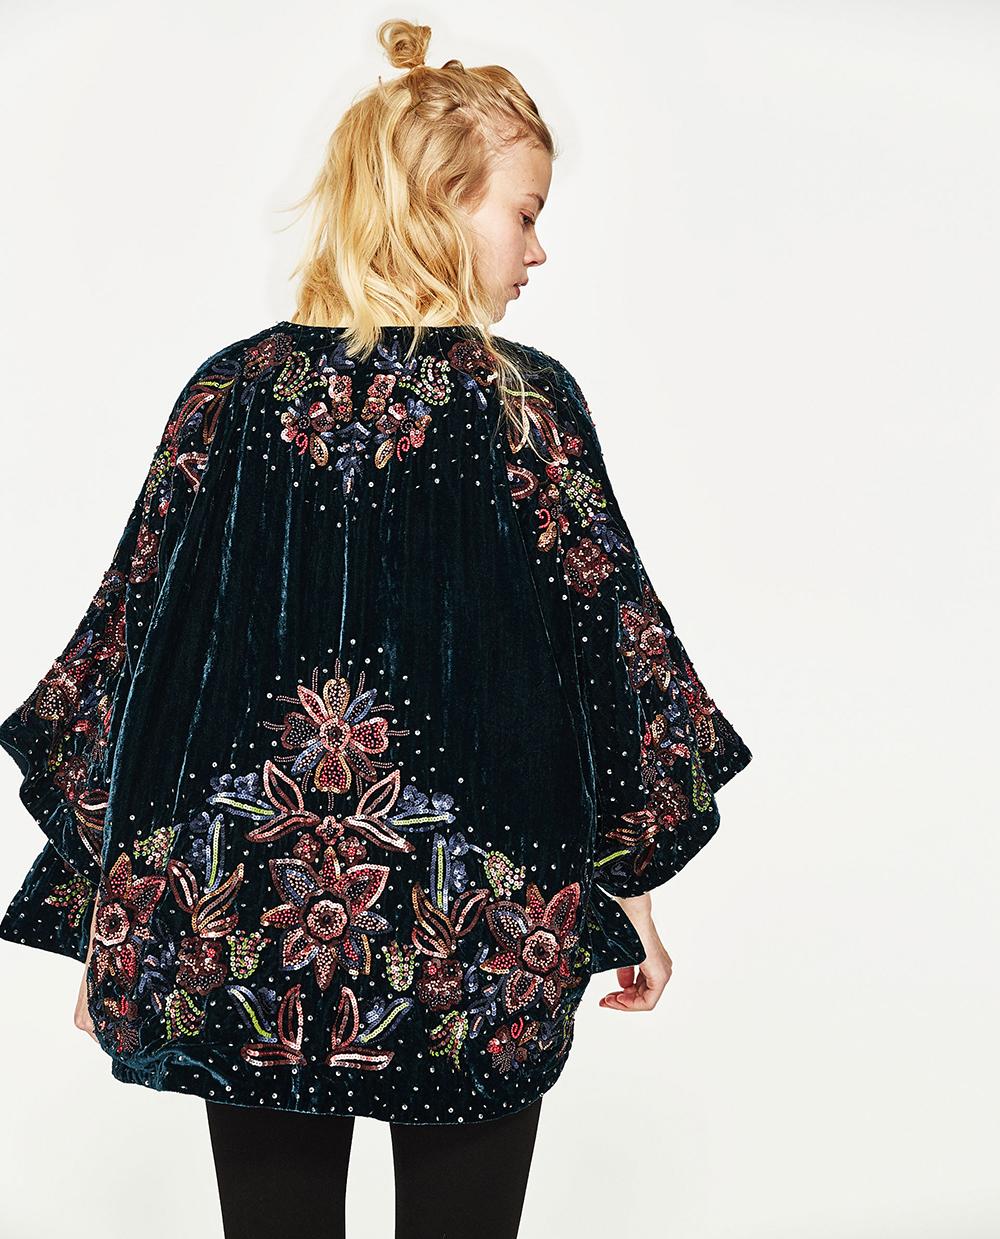 Zara Sequined Kimono